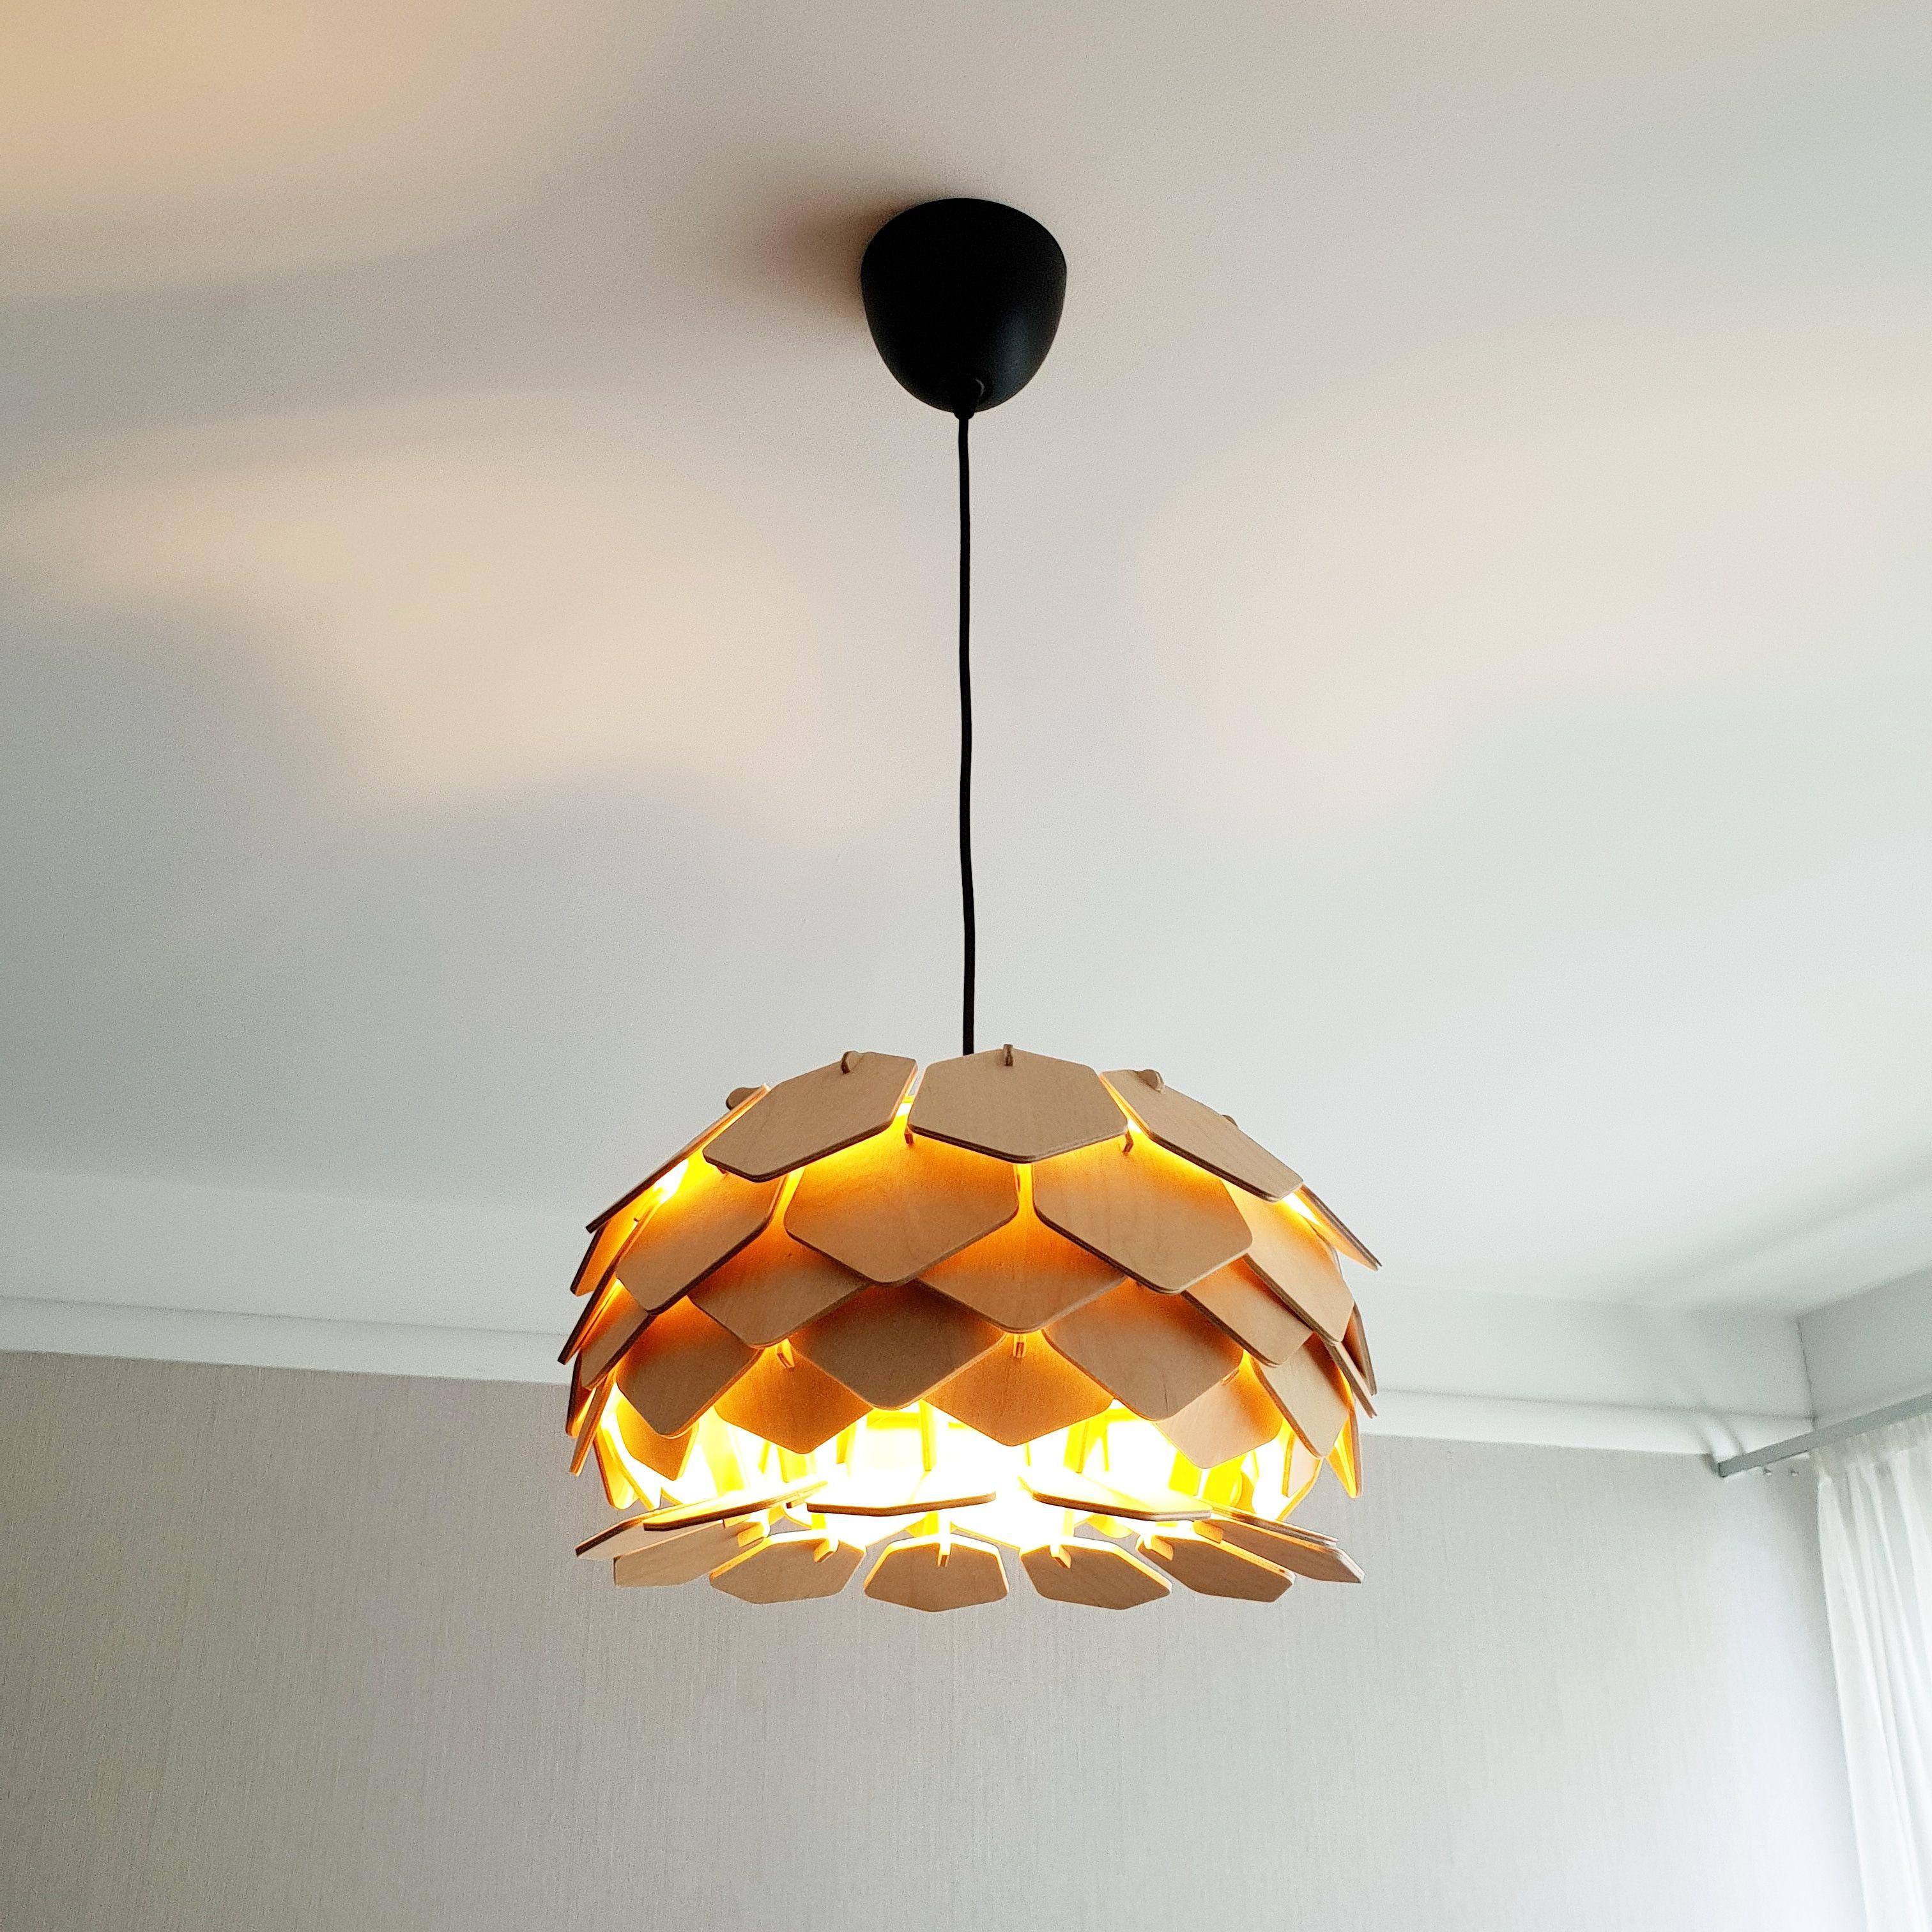 Chill Light Wood Lamp Wooden Lamp Shade Hanging Lamp